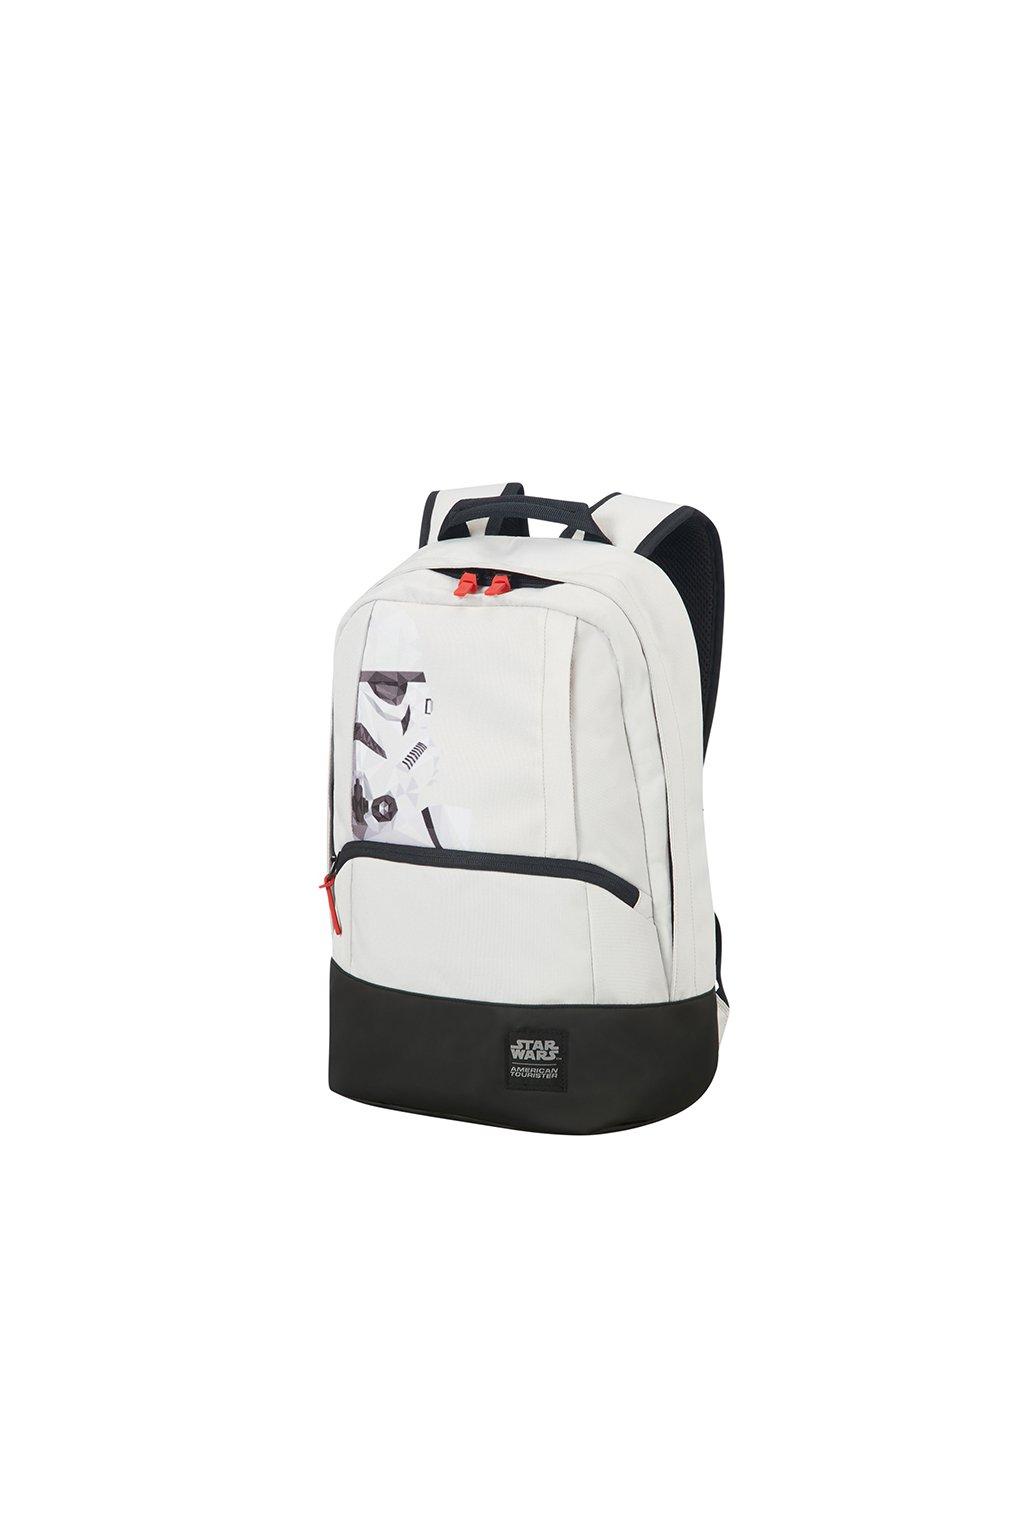 kufrland americantourister grabngo backpack disney starwars stormtrooper (1)